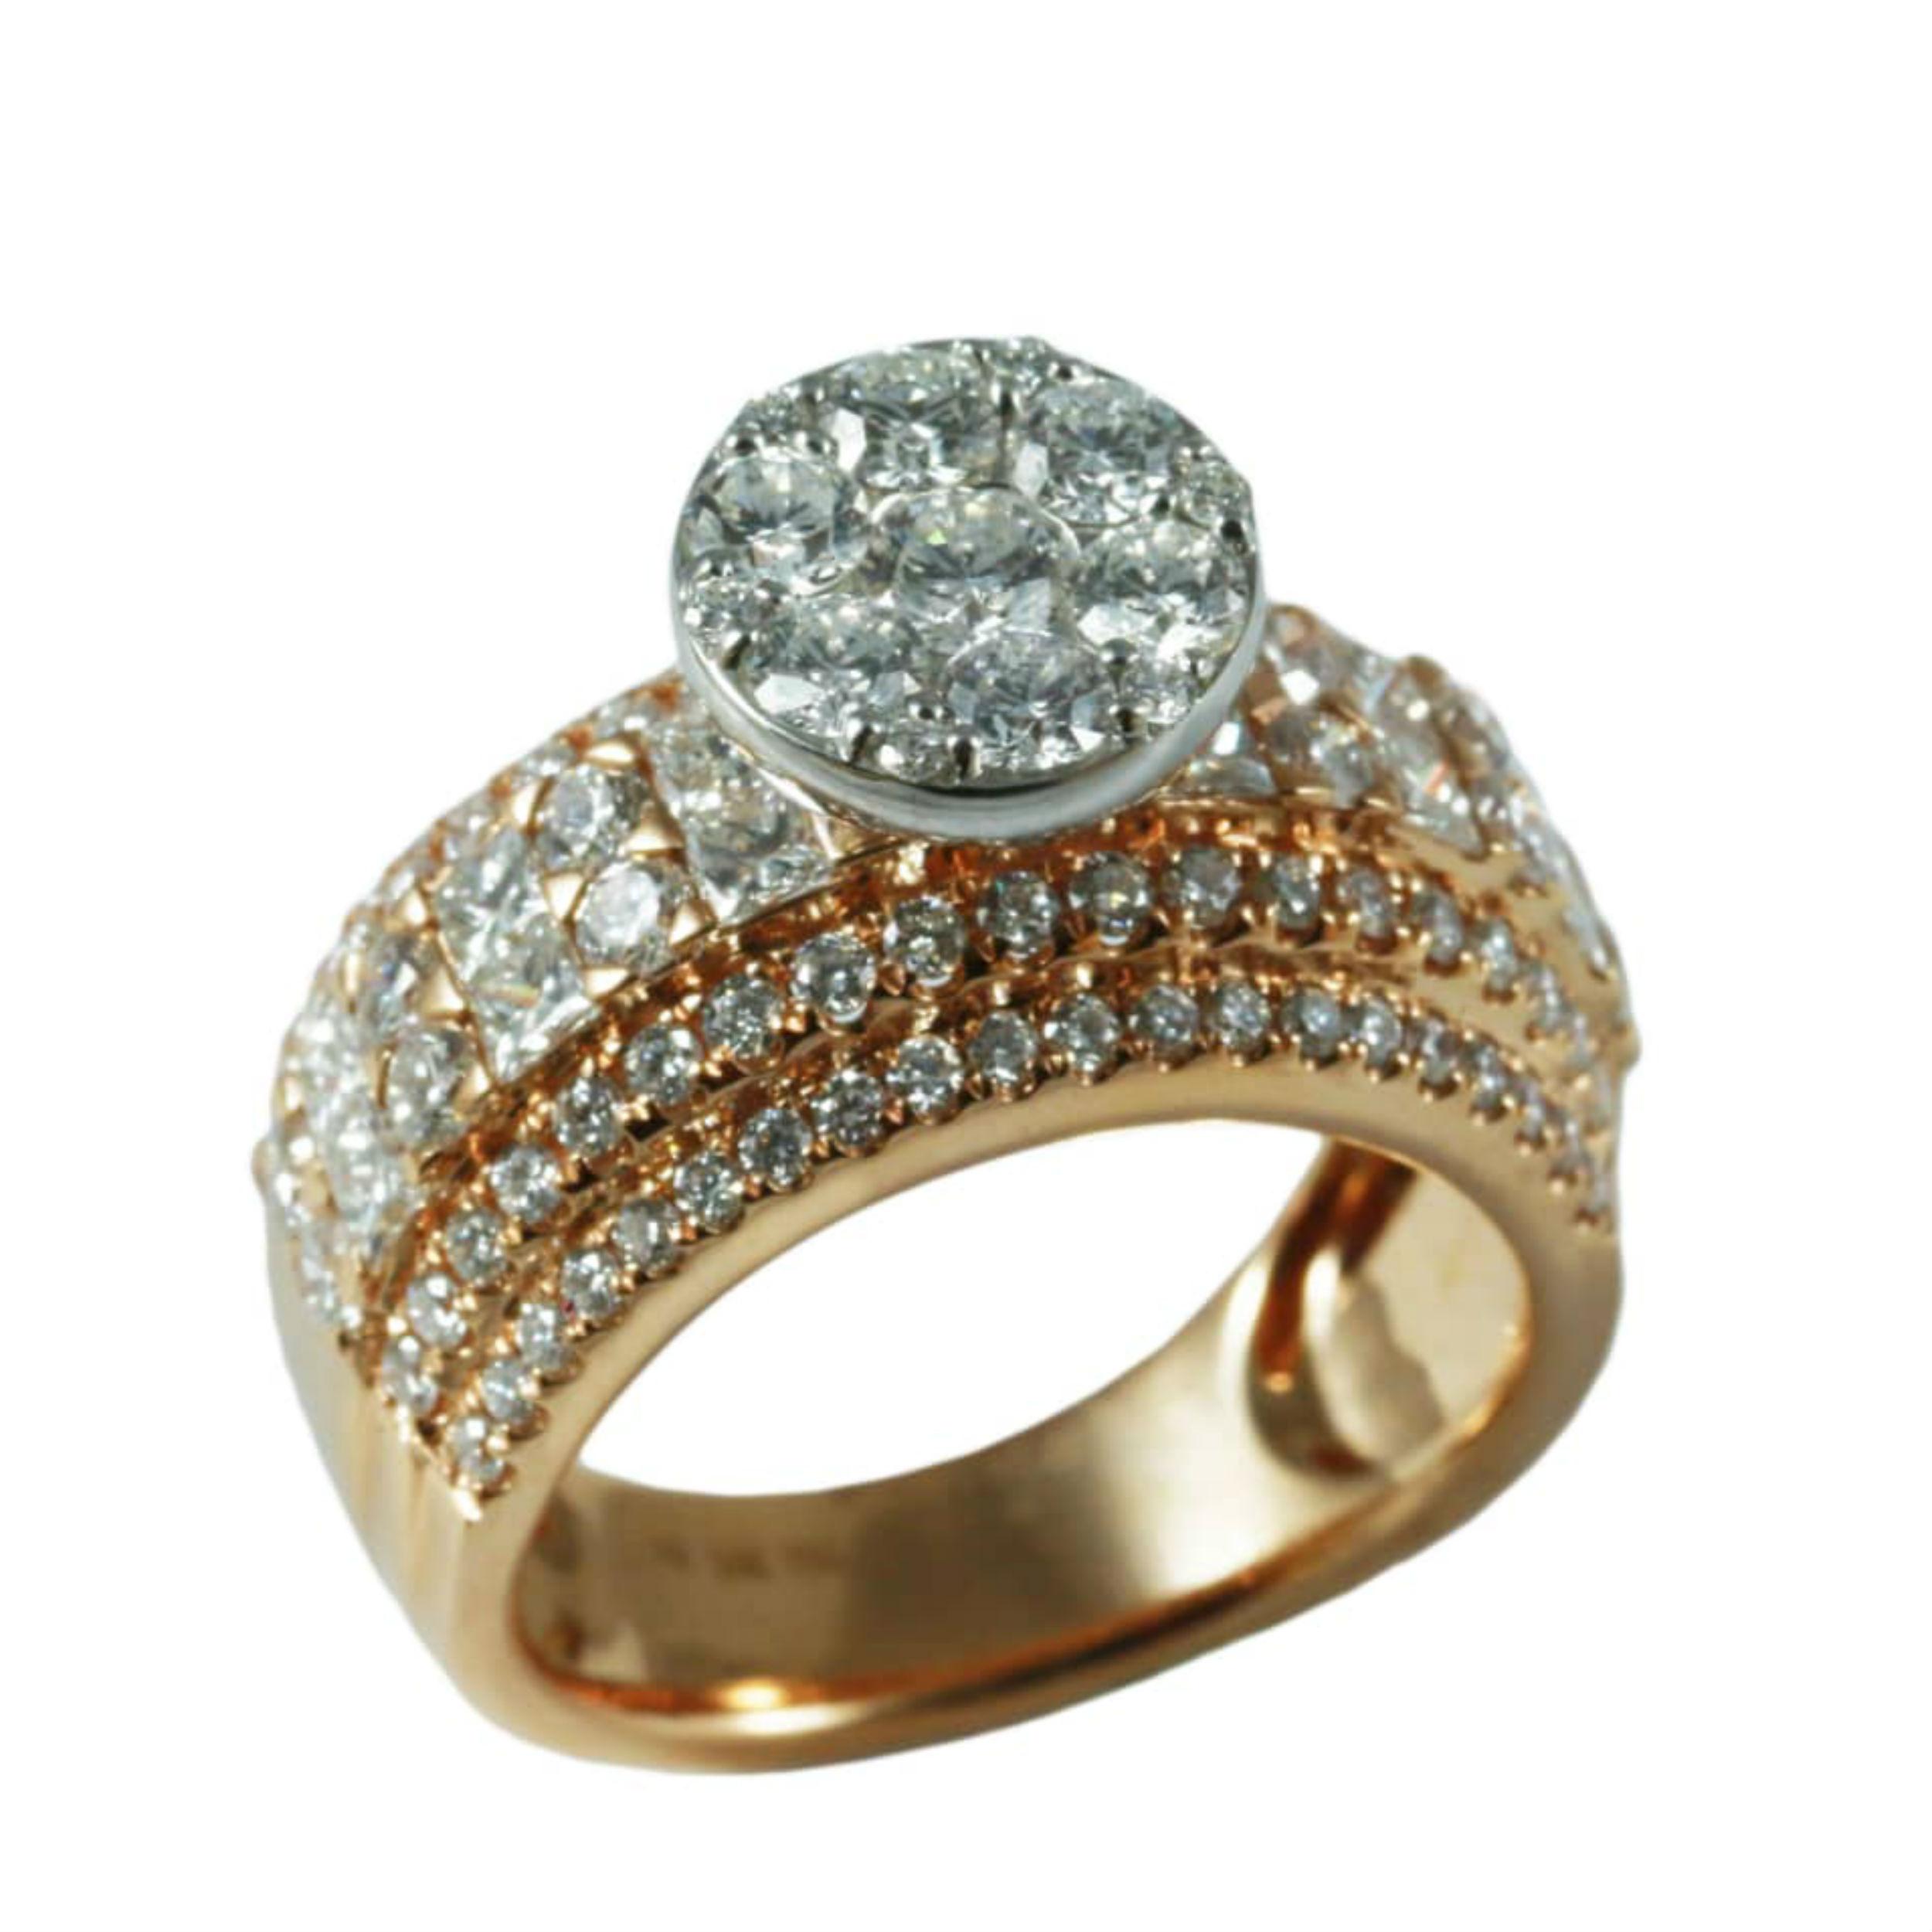 قیمت انگشتر طلا 18 عیار زنانه مدل KG1006